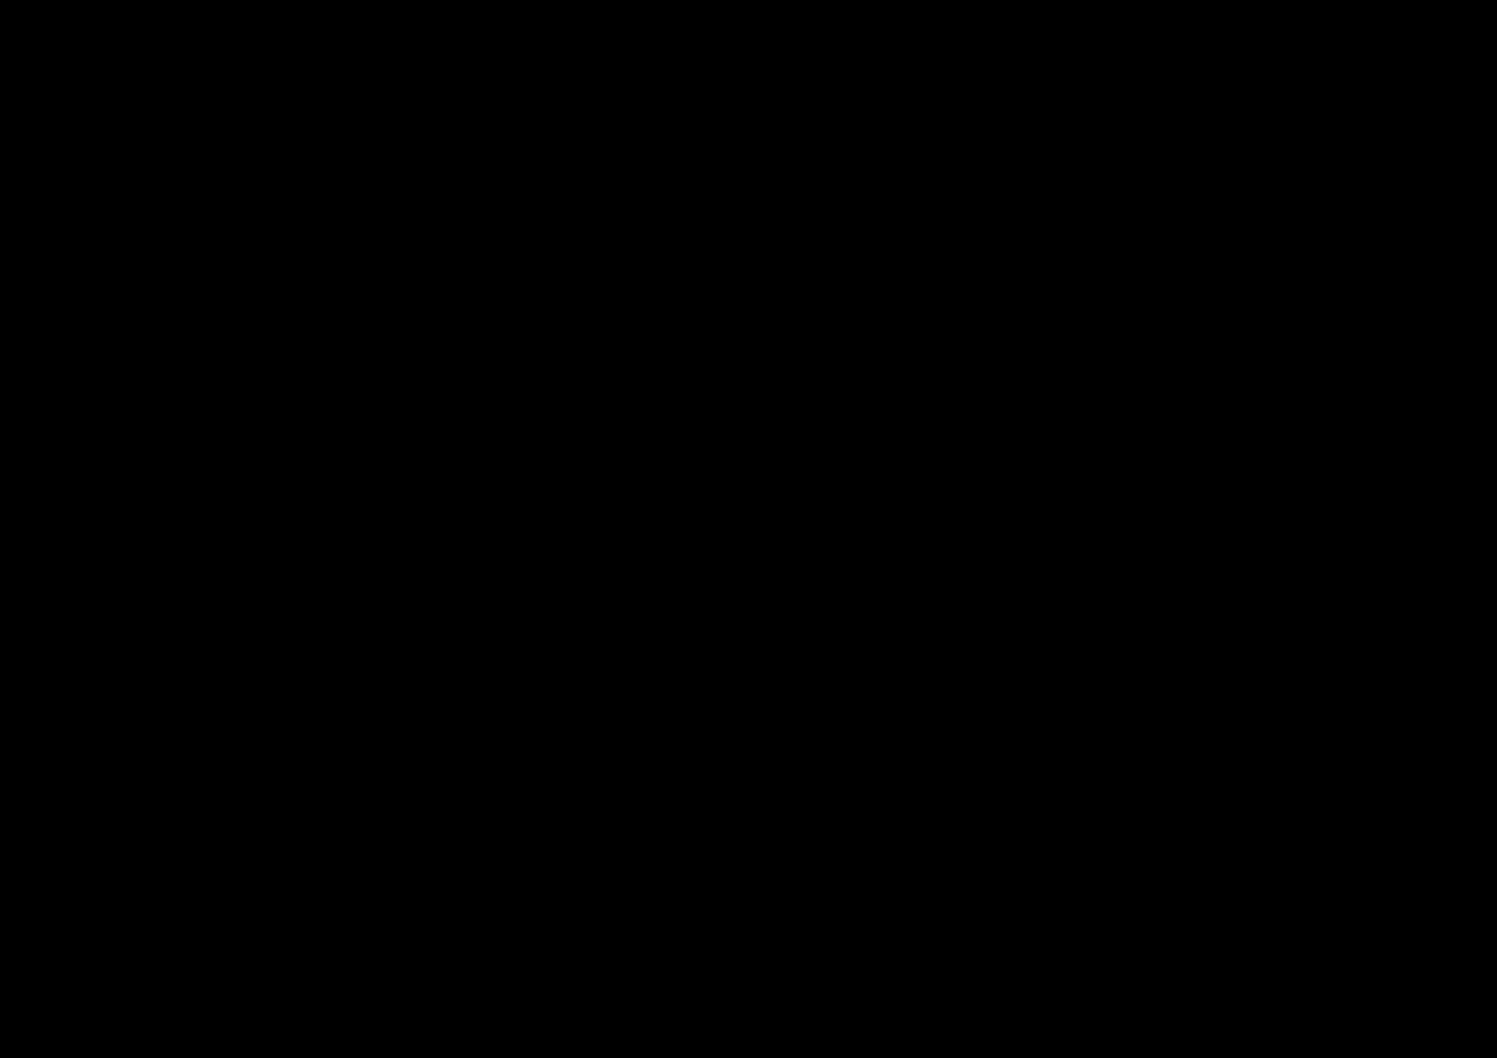 lci-linked-pdf